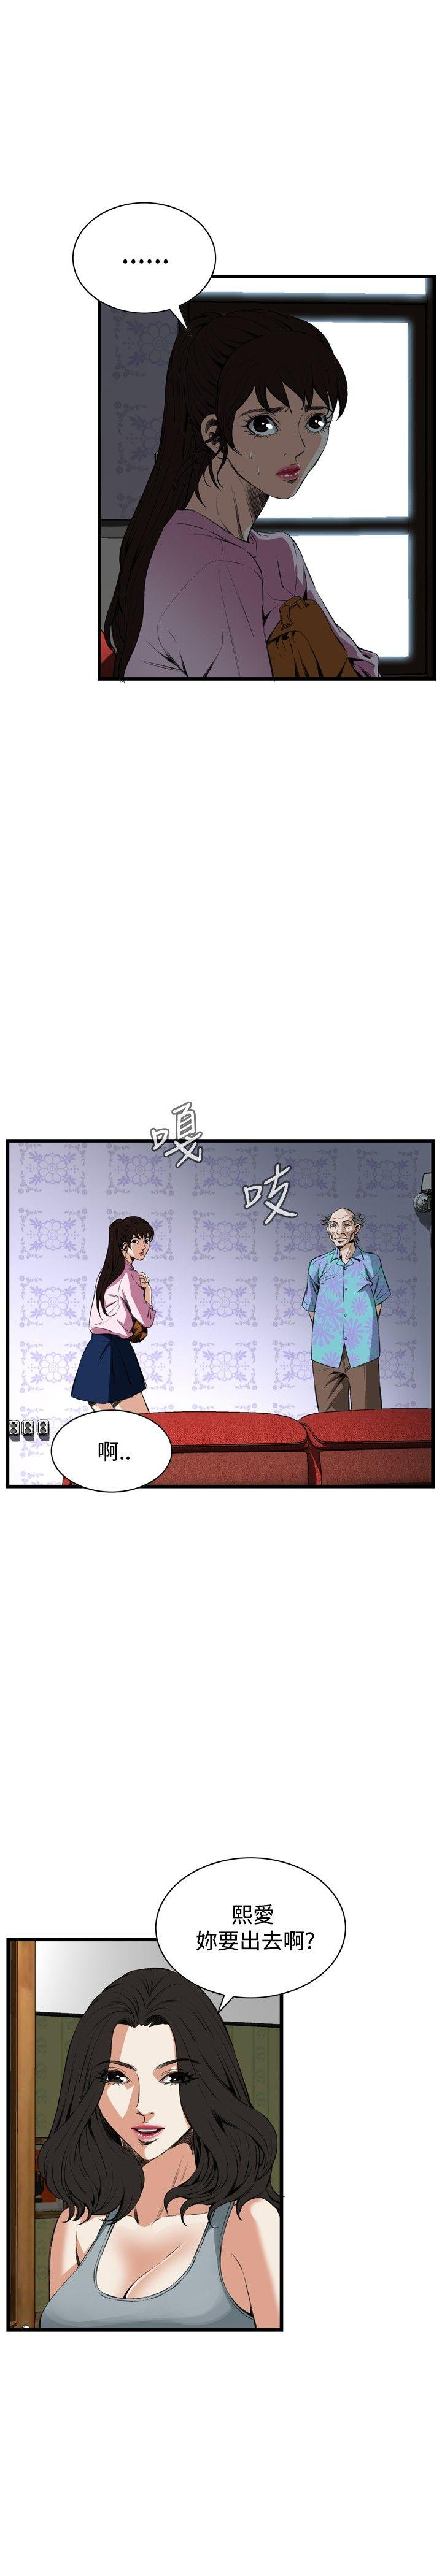 Take a Peek 偷窥 Ch.39~55 [Chinese]中文 501